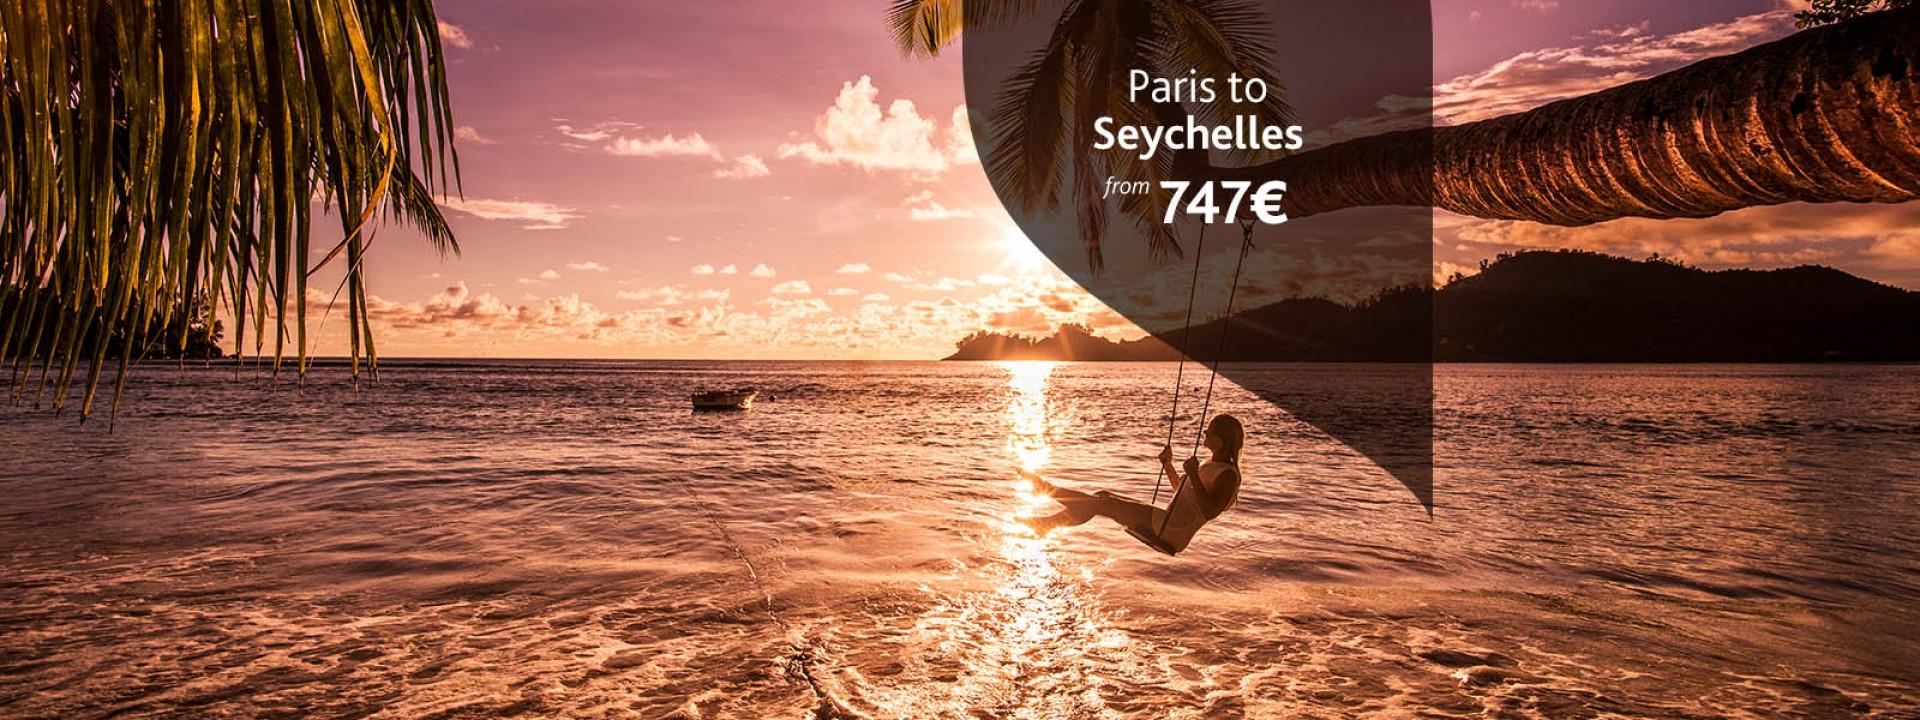 flights-from-paris-to-mahe-seychelles-economy